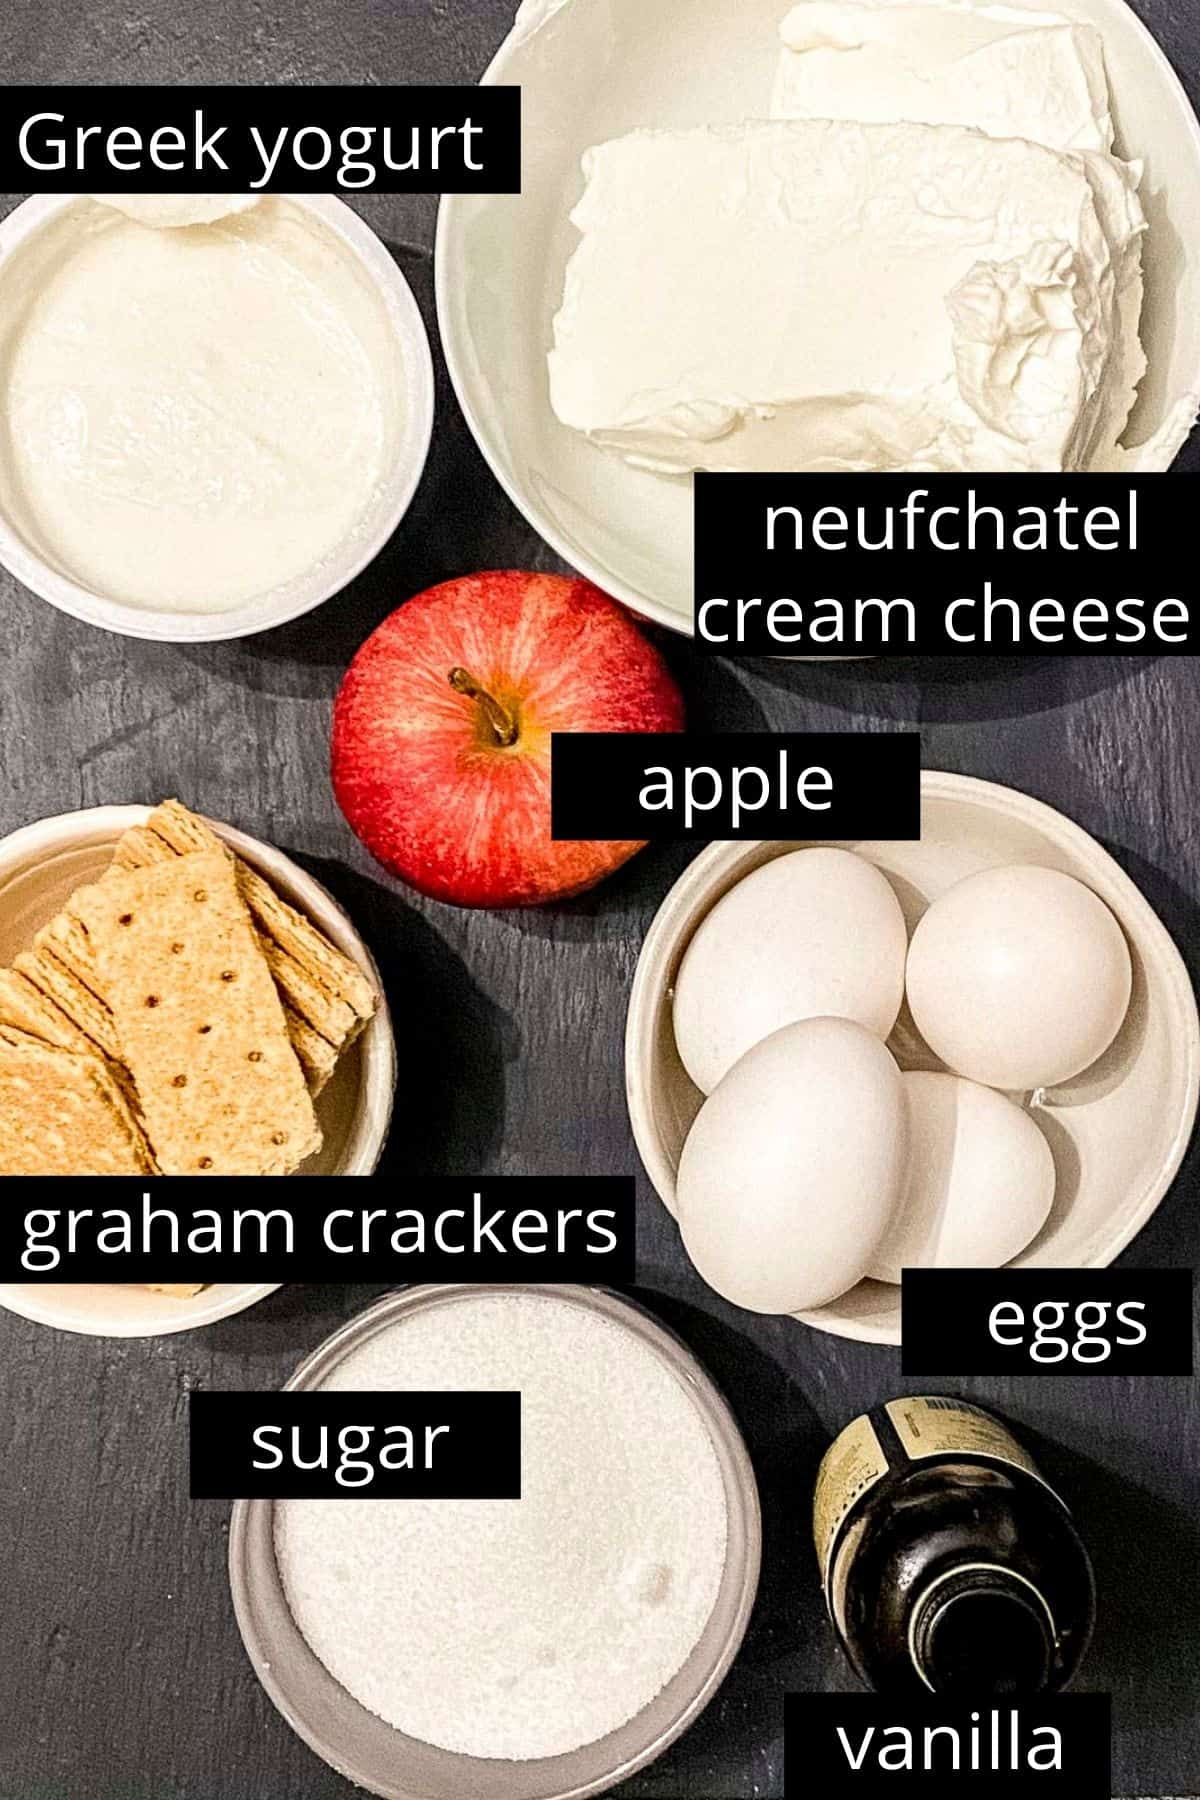 Overhead view of ingredients; greek yogurt, cream cheese, an apple, graham crackers, four eggs, sugar, and vanilla